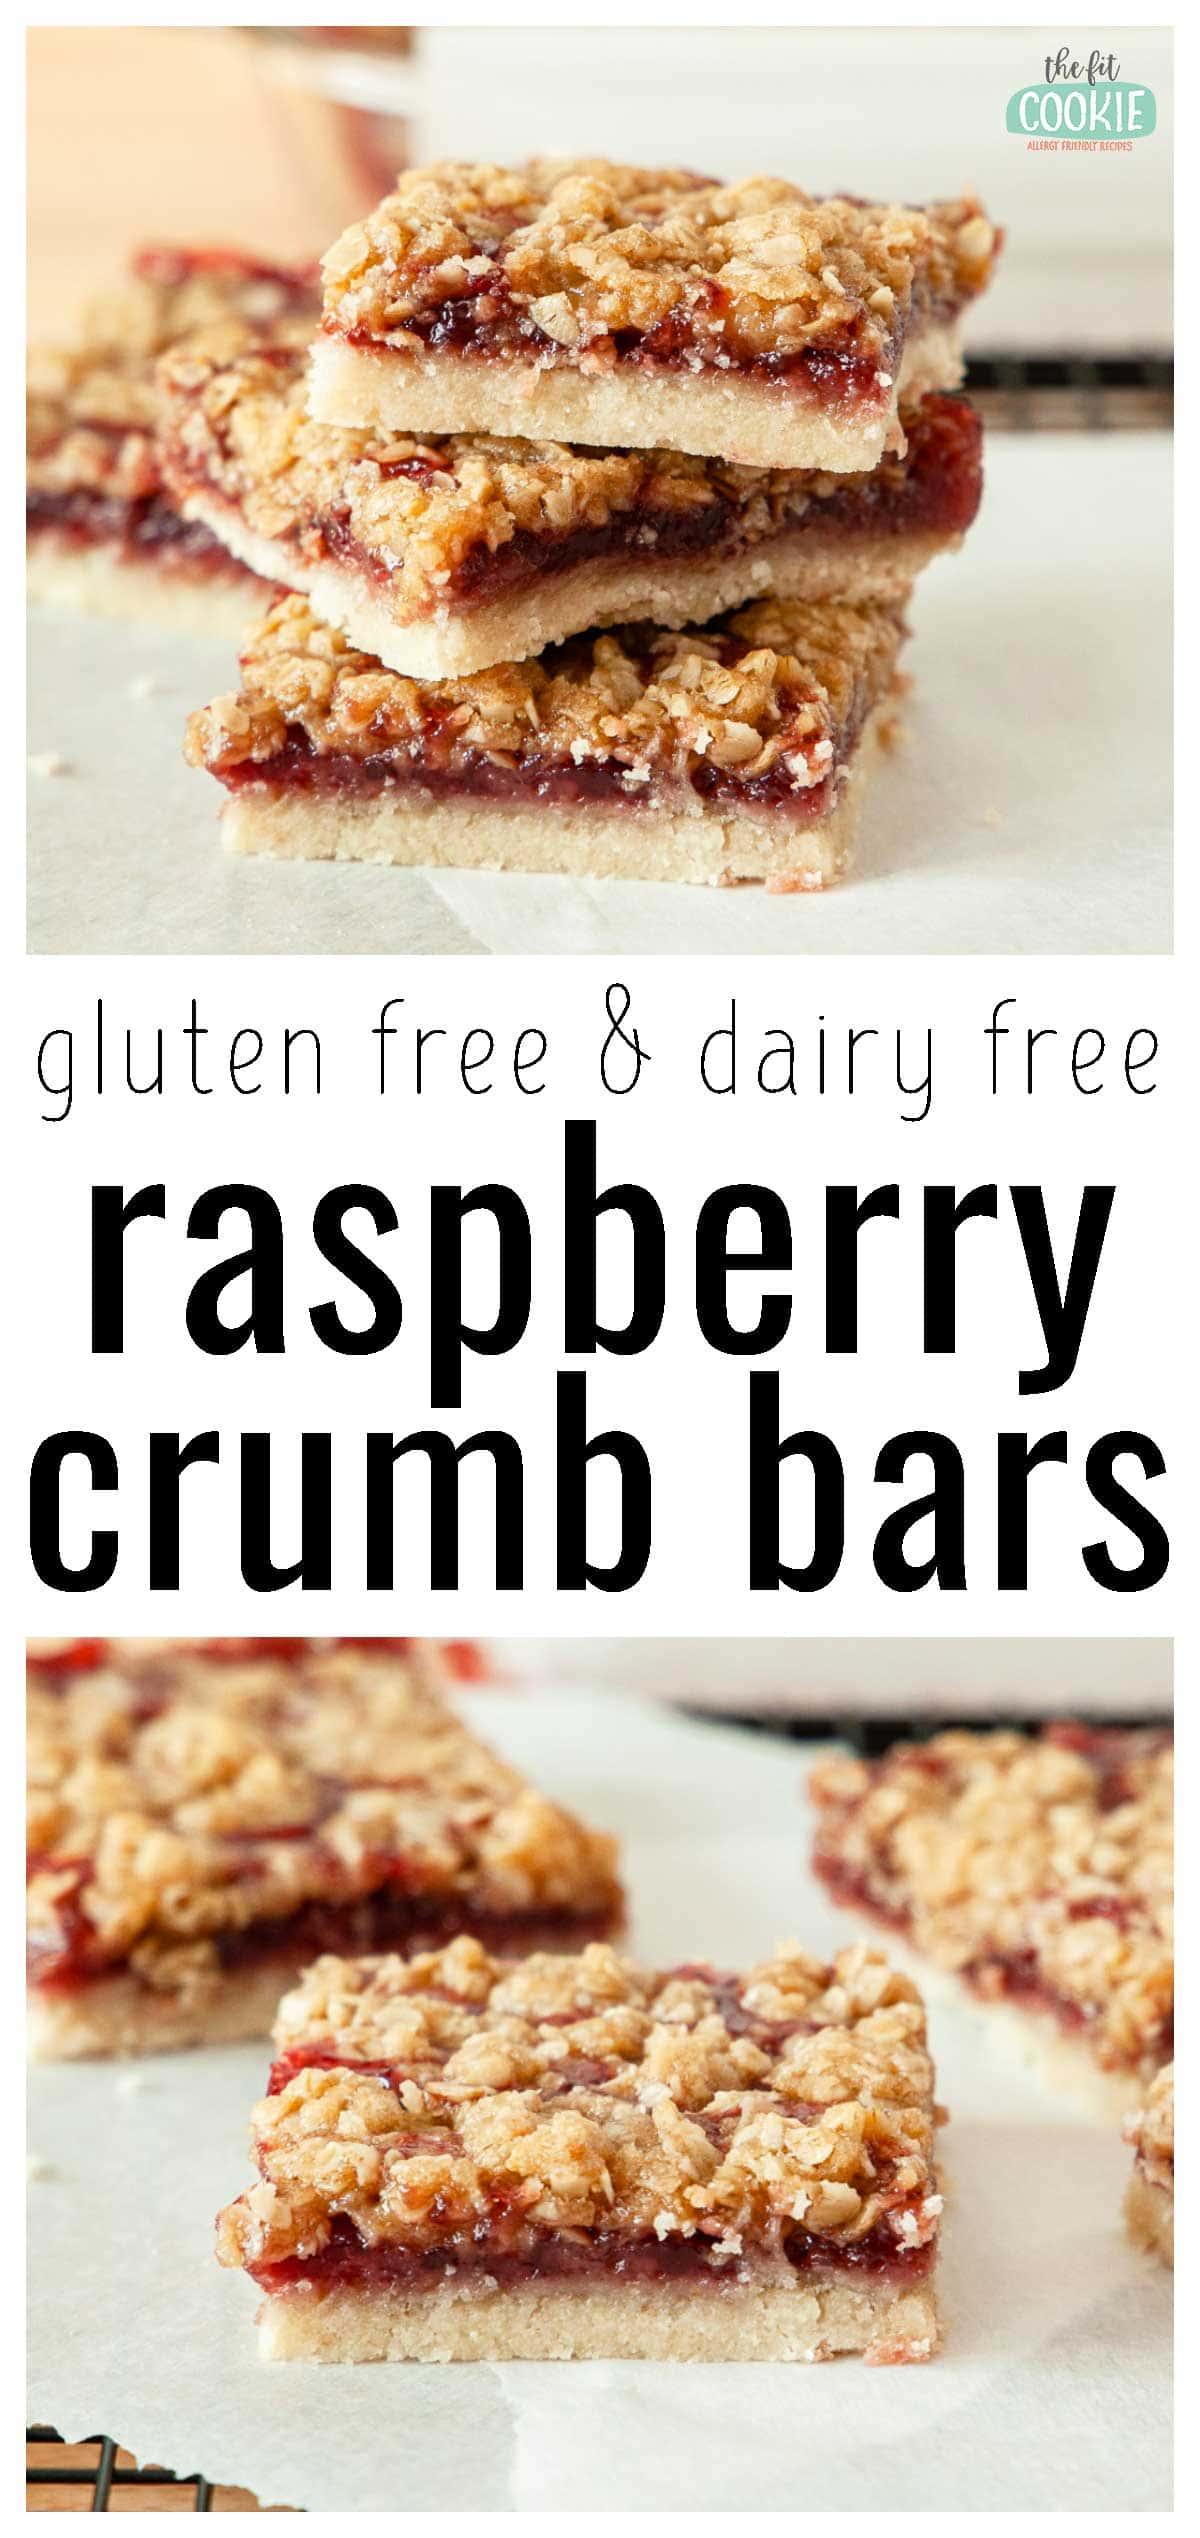 photo collage of gluten free raspberry crumb bars